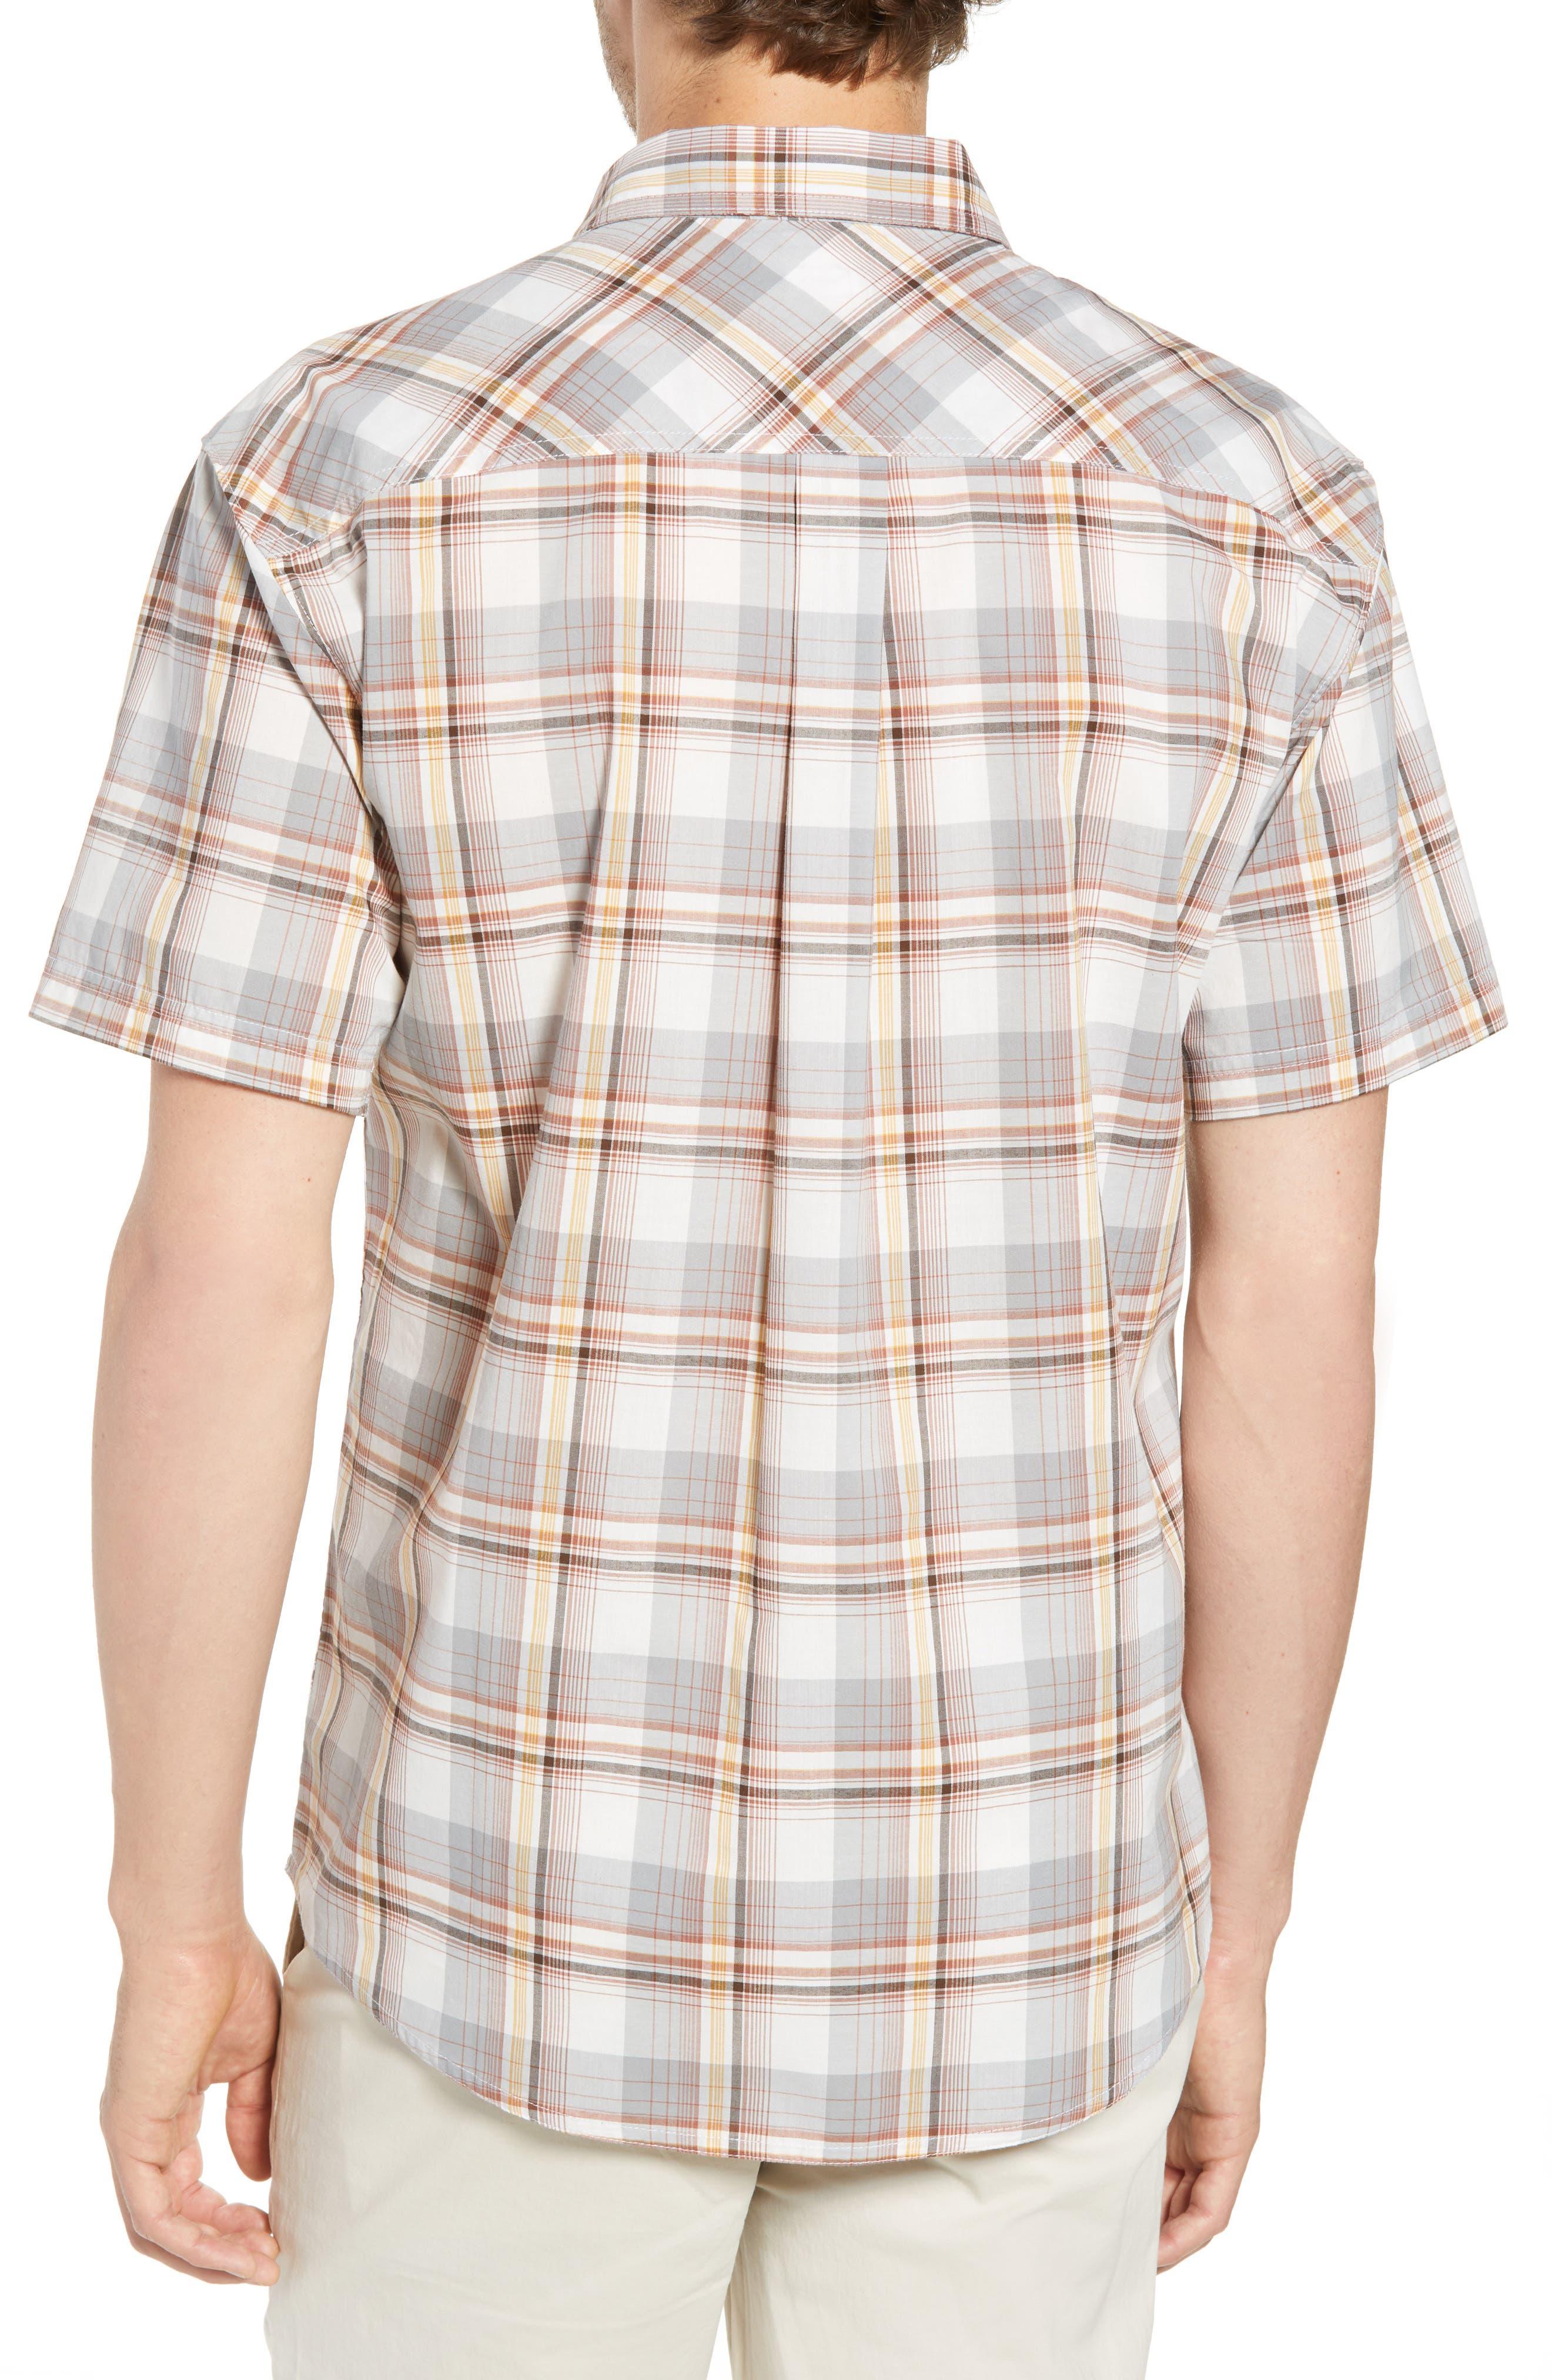 Gentry Short Sleeve Shirt,                             Alternate thumbnail 5, color,